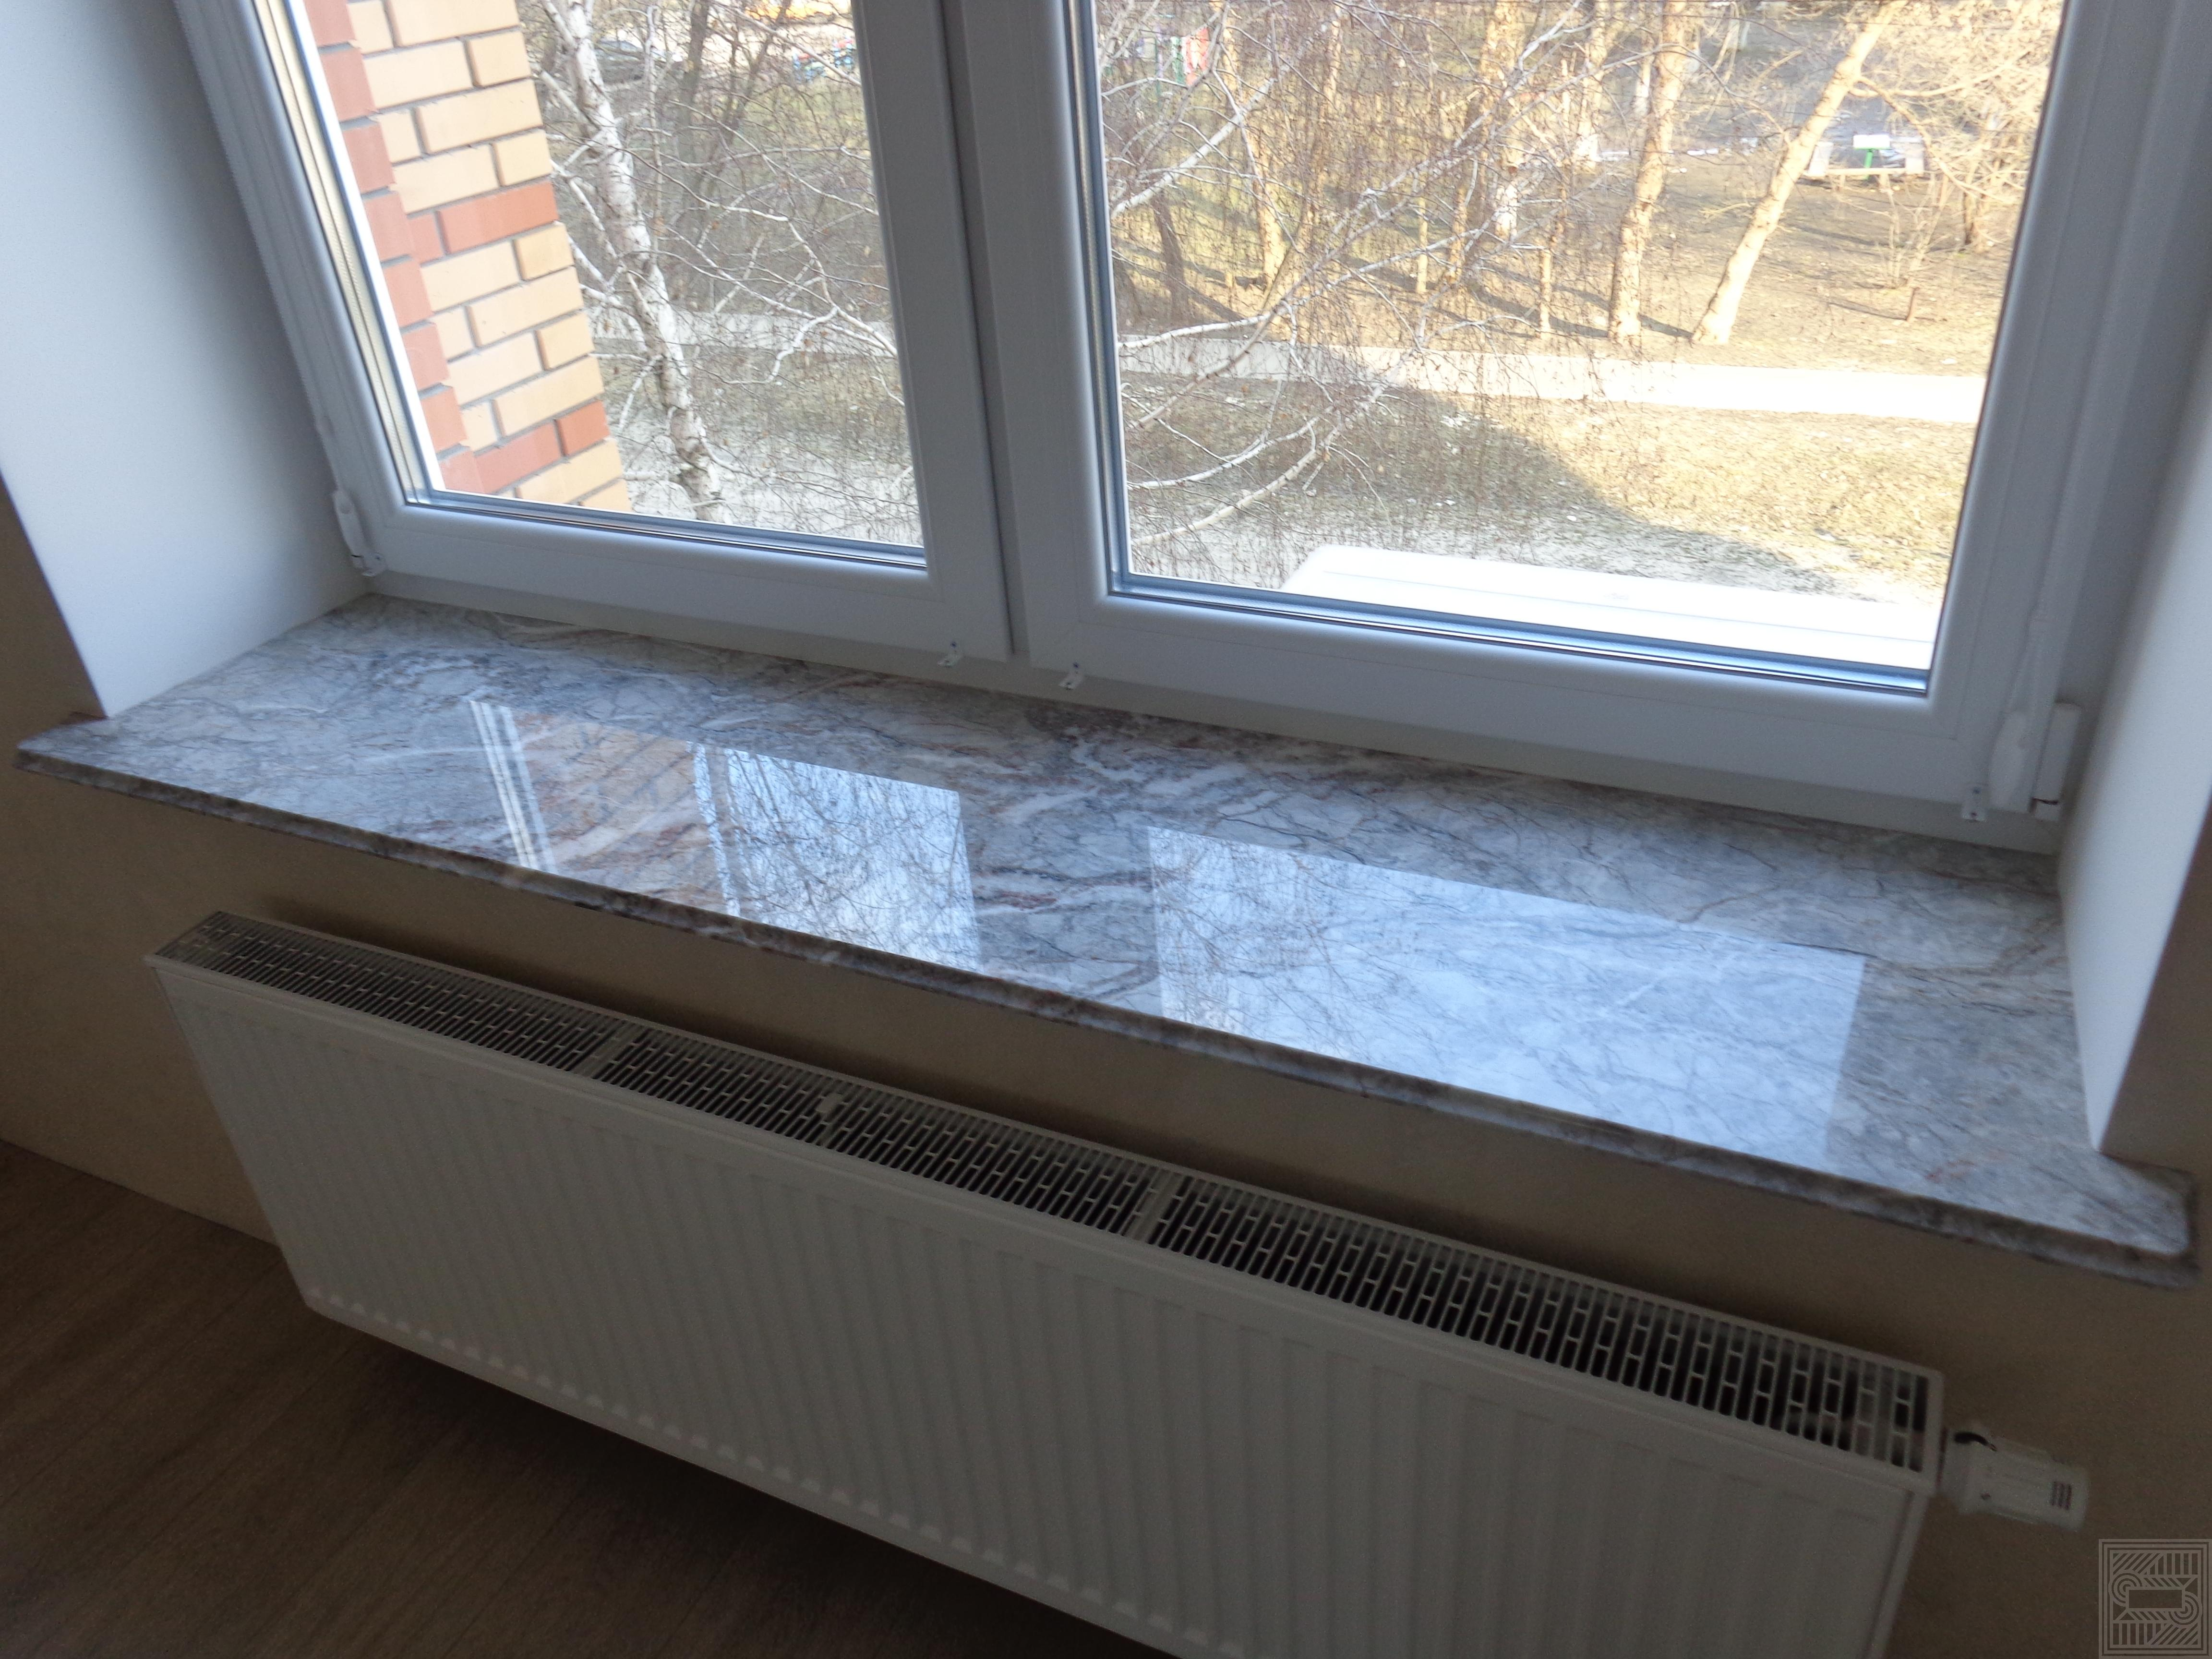 Подоконник из мрамора Fior di Pesco 20 мм windowsill-marble - Podokonnik iz mramora Fior di Pesco 20 mm